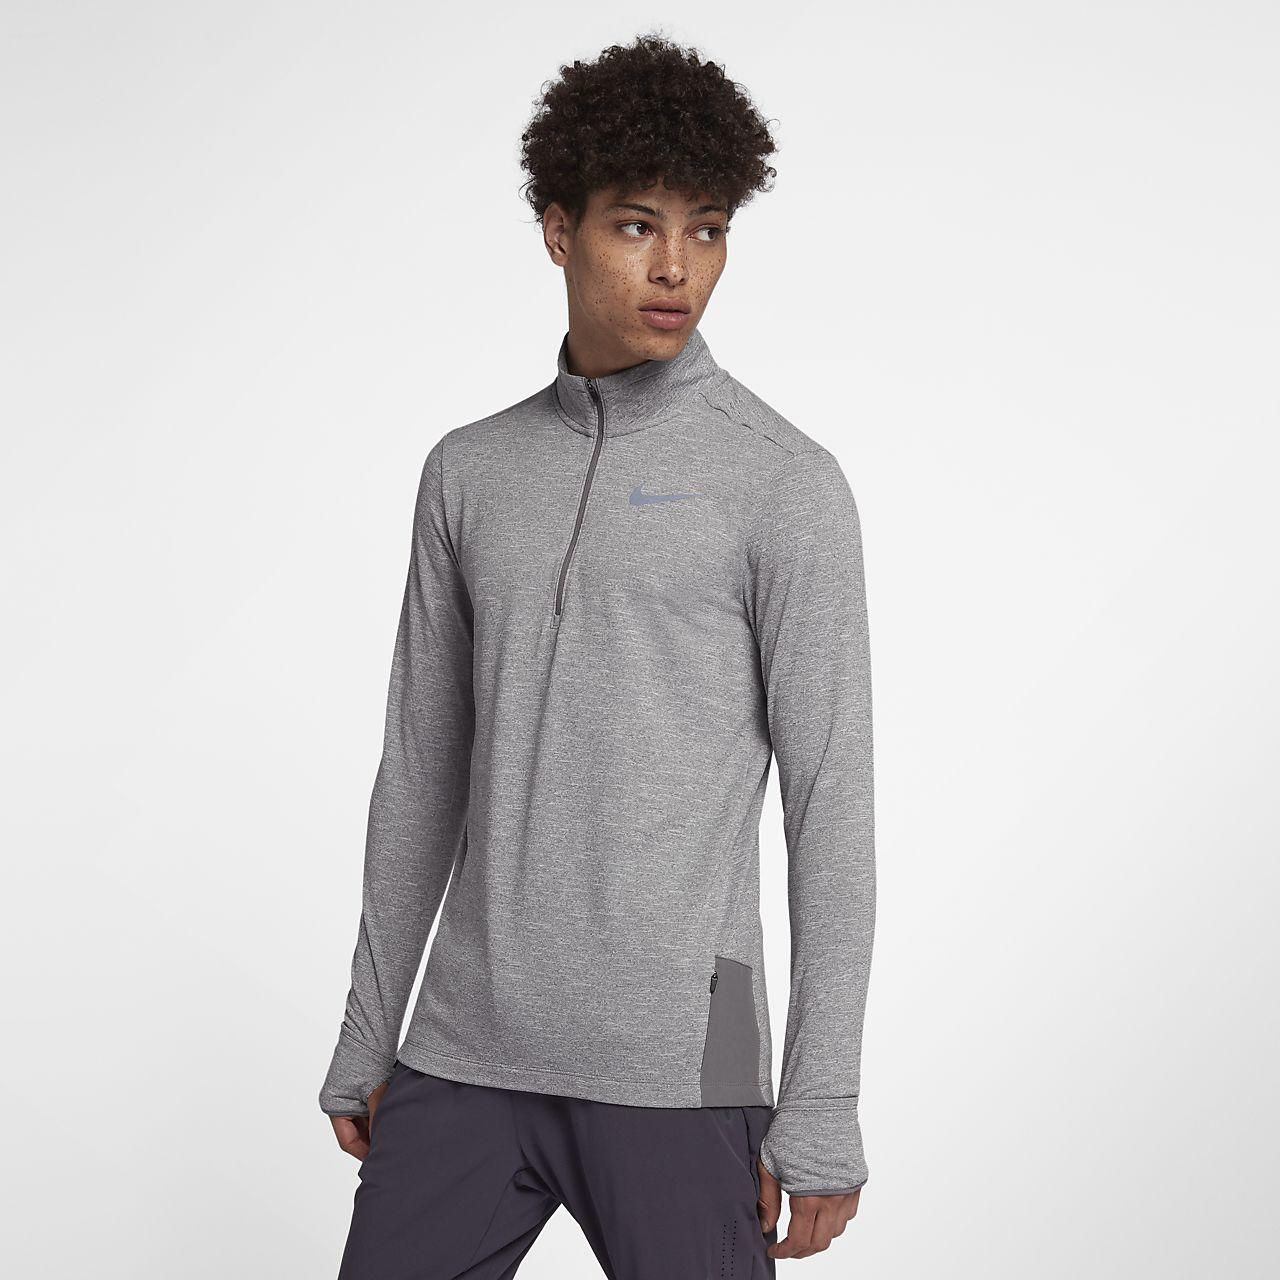 Zip Pour À Therma Sphere De Running Nike Demi Haut HommeFr FlJ1cK